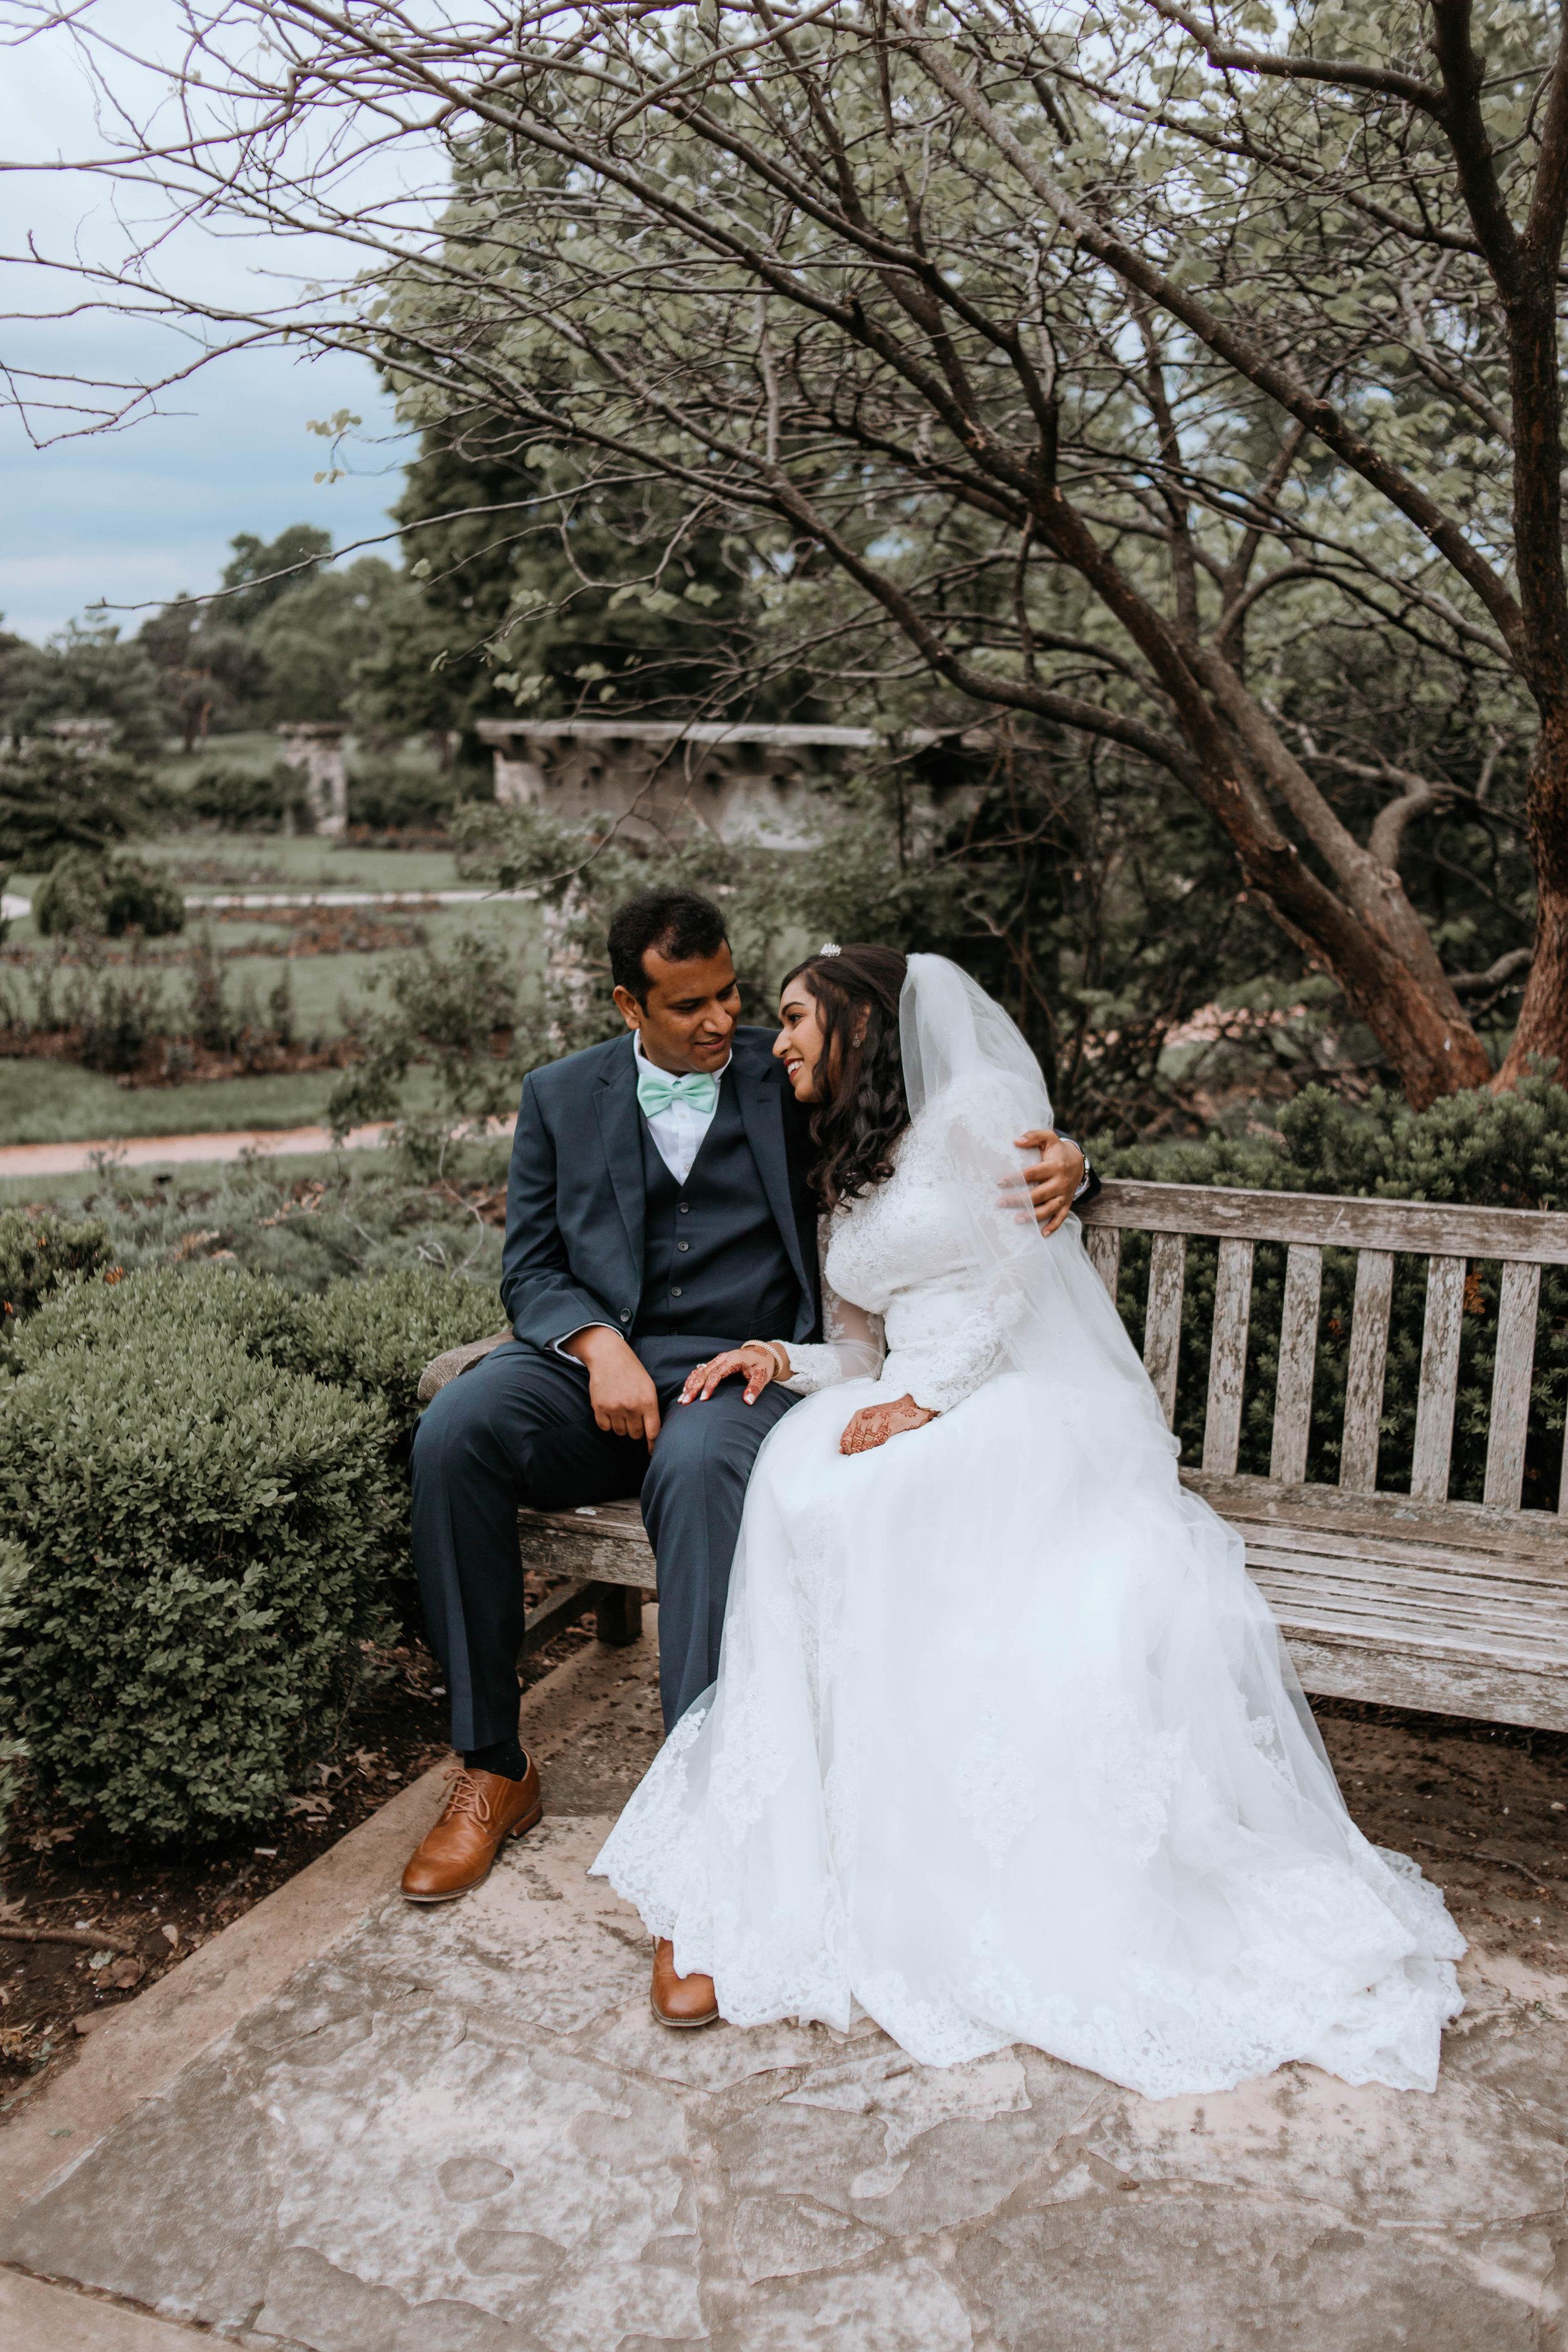 PILLI WEDDING